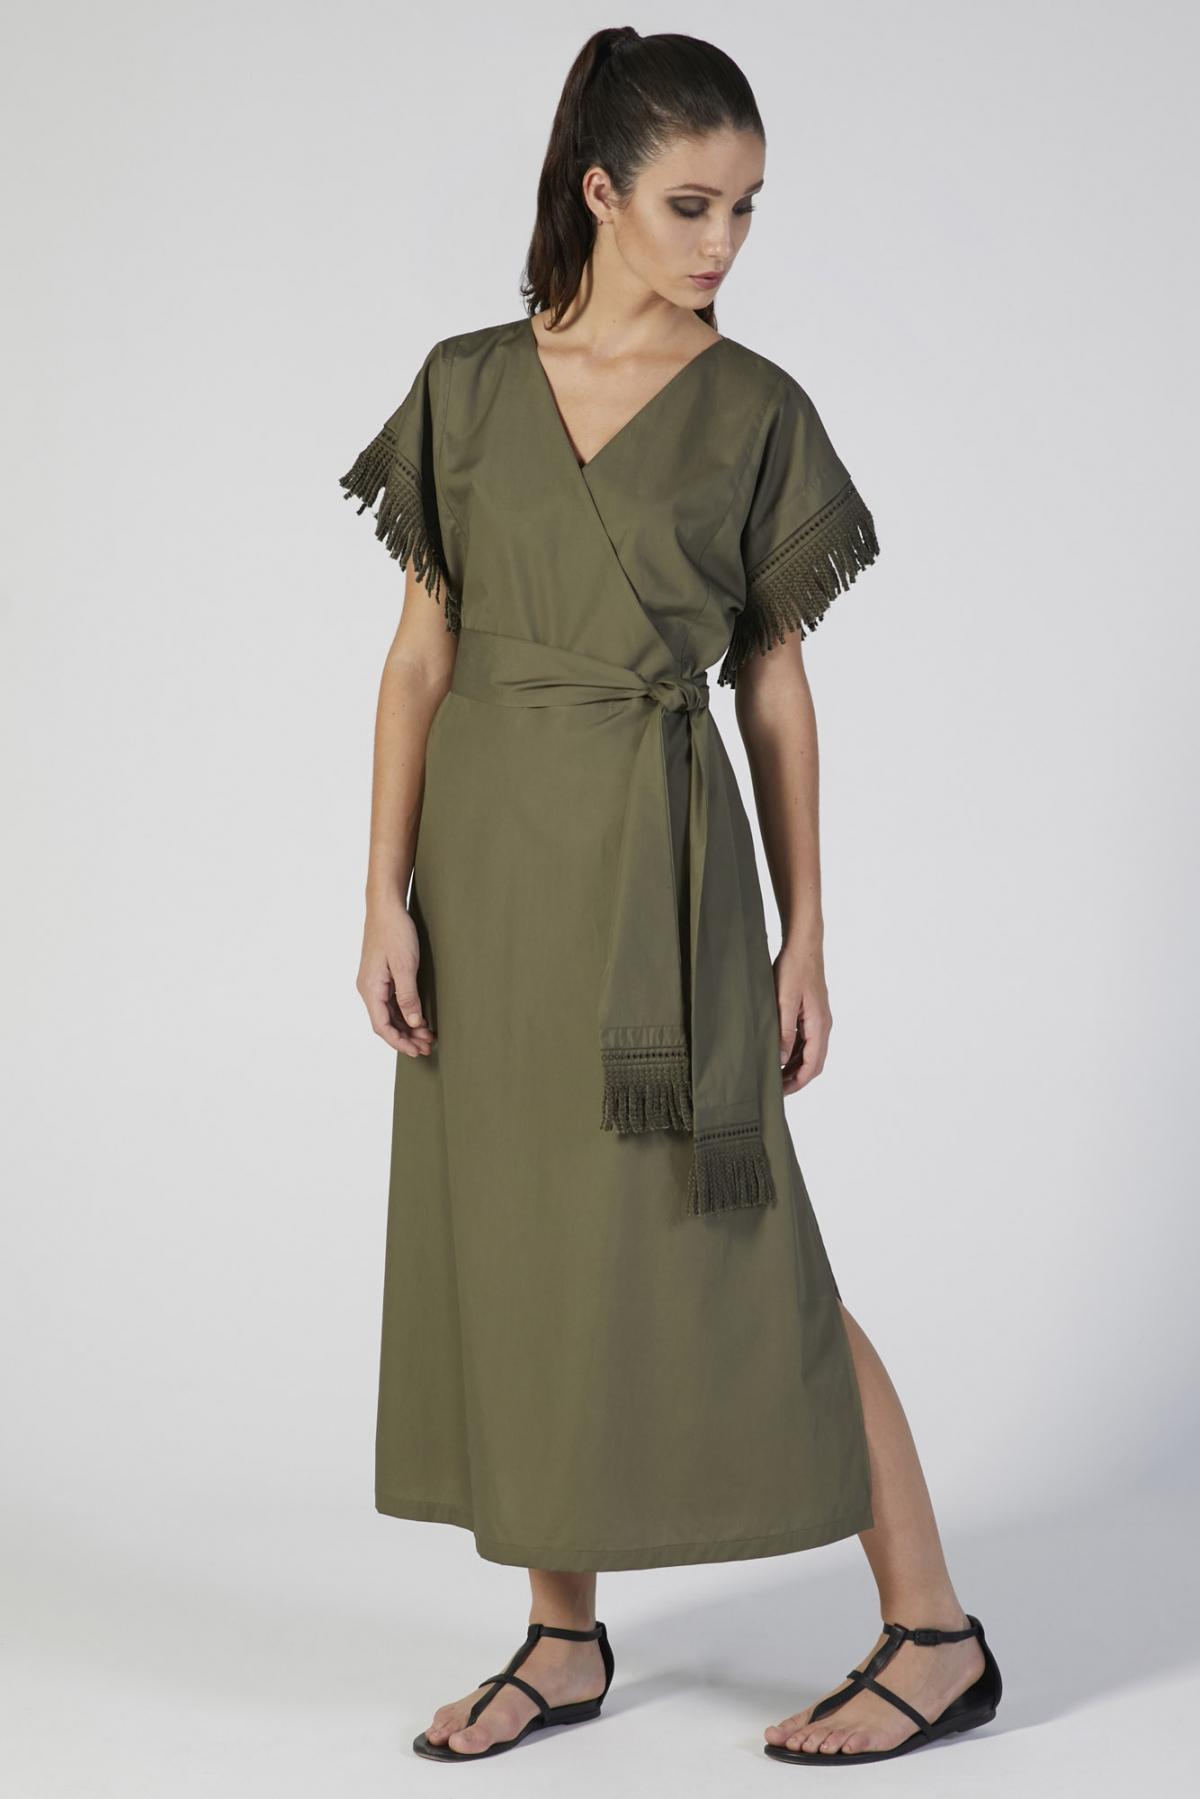 copricostume manica corta verdiani donna loungewear